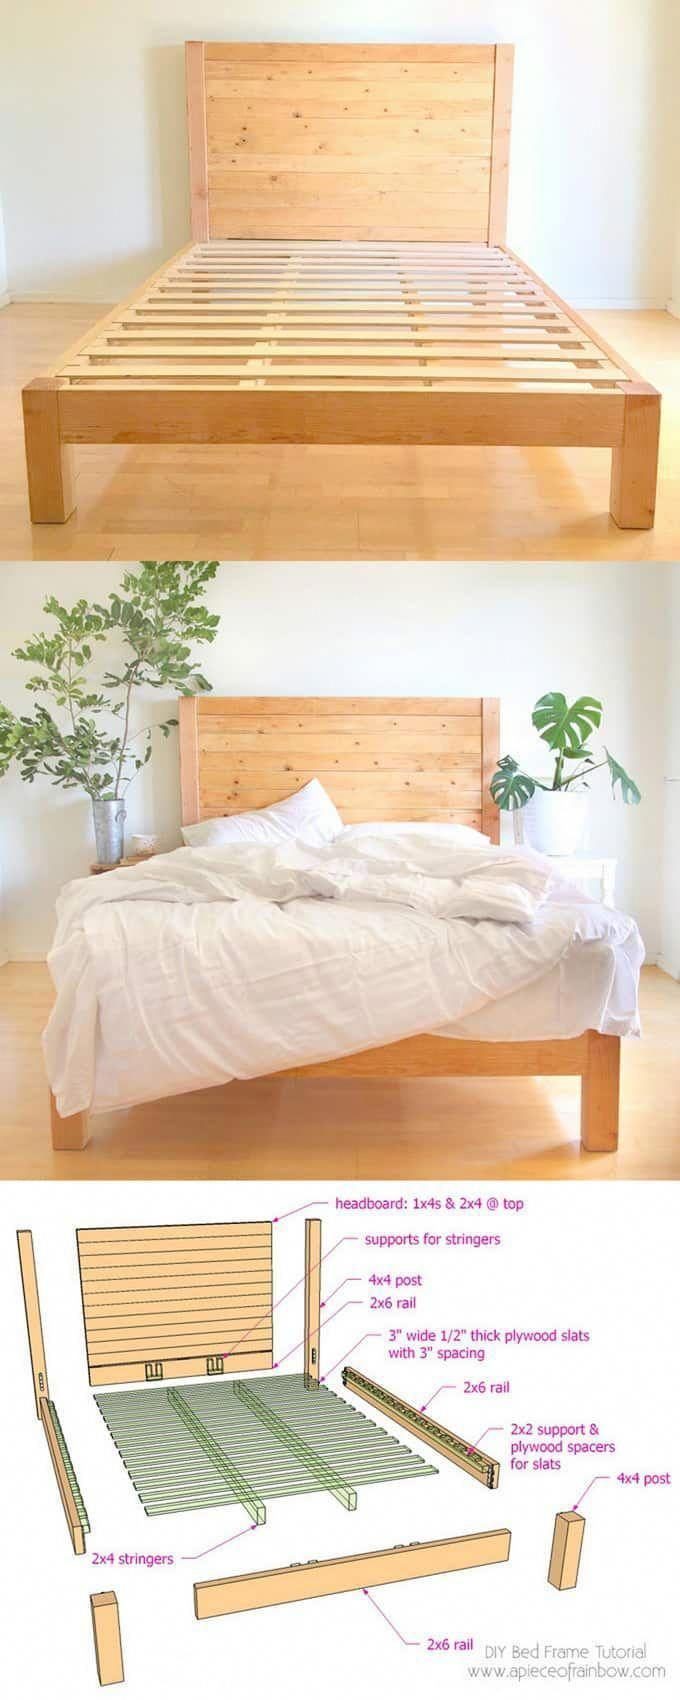 Bed Frames Queen Size With Wheels Furniturebali Bedframes In